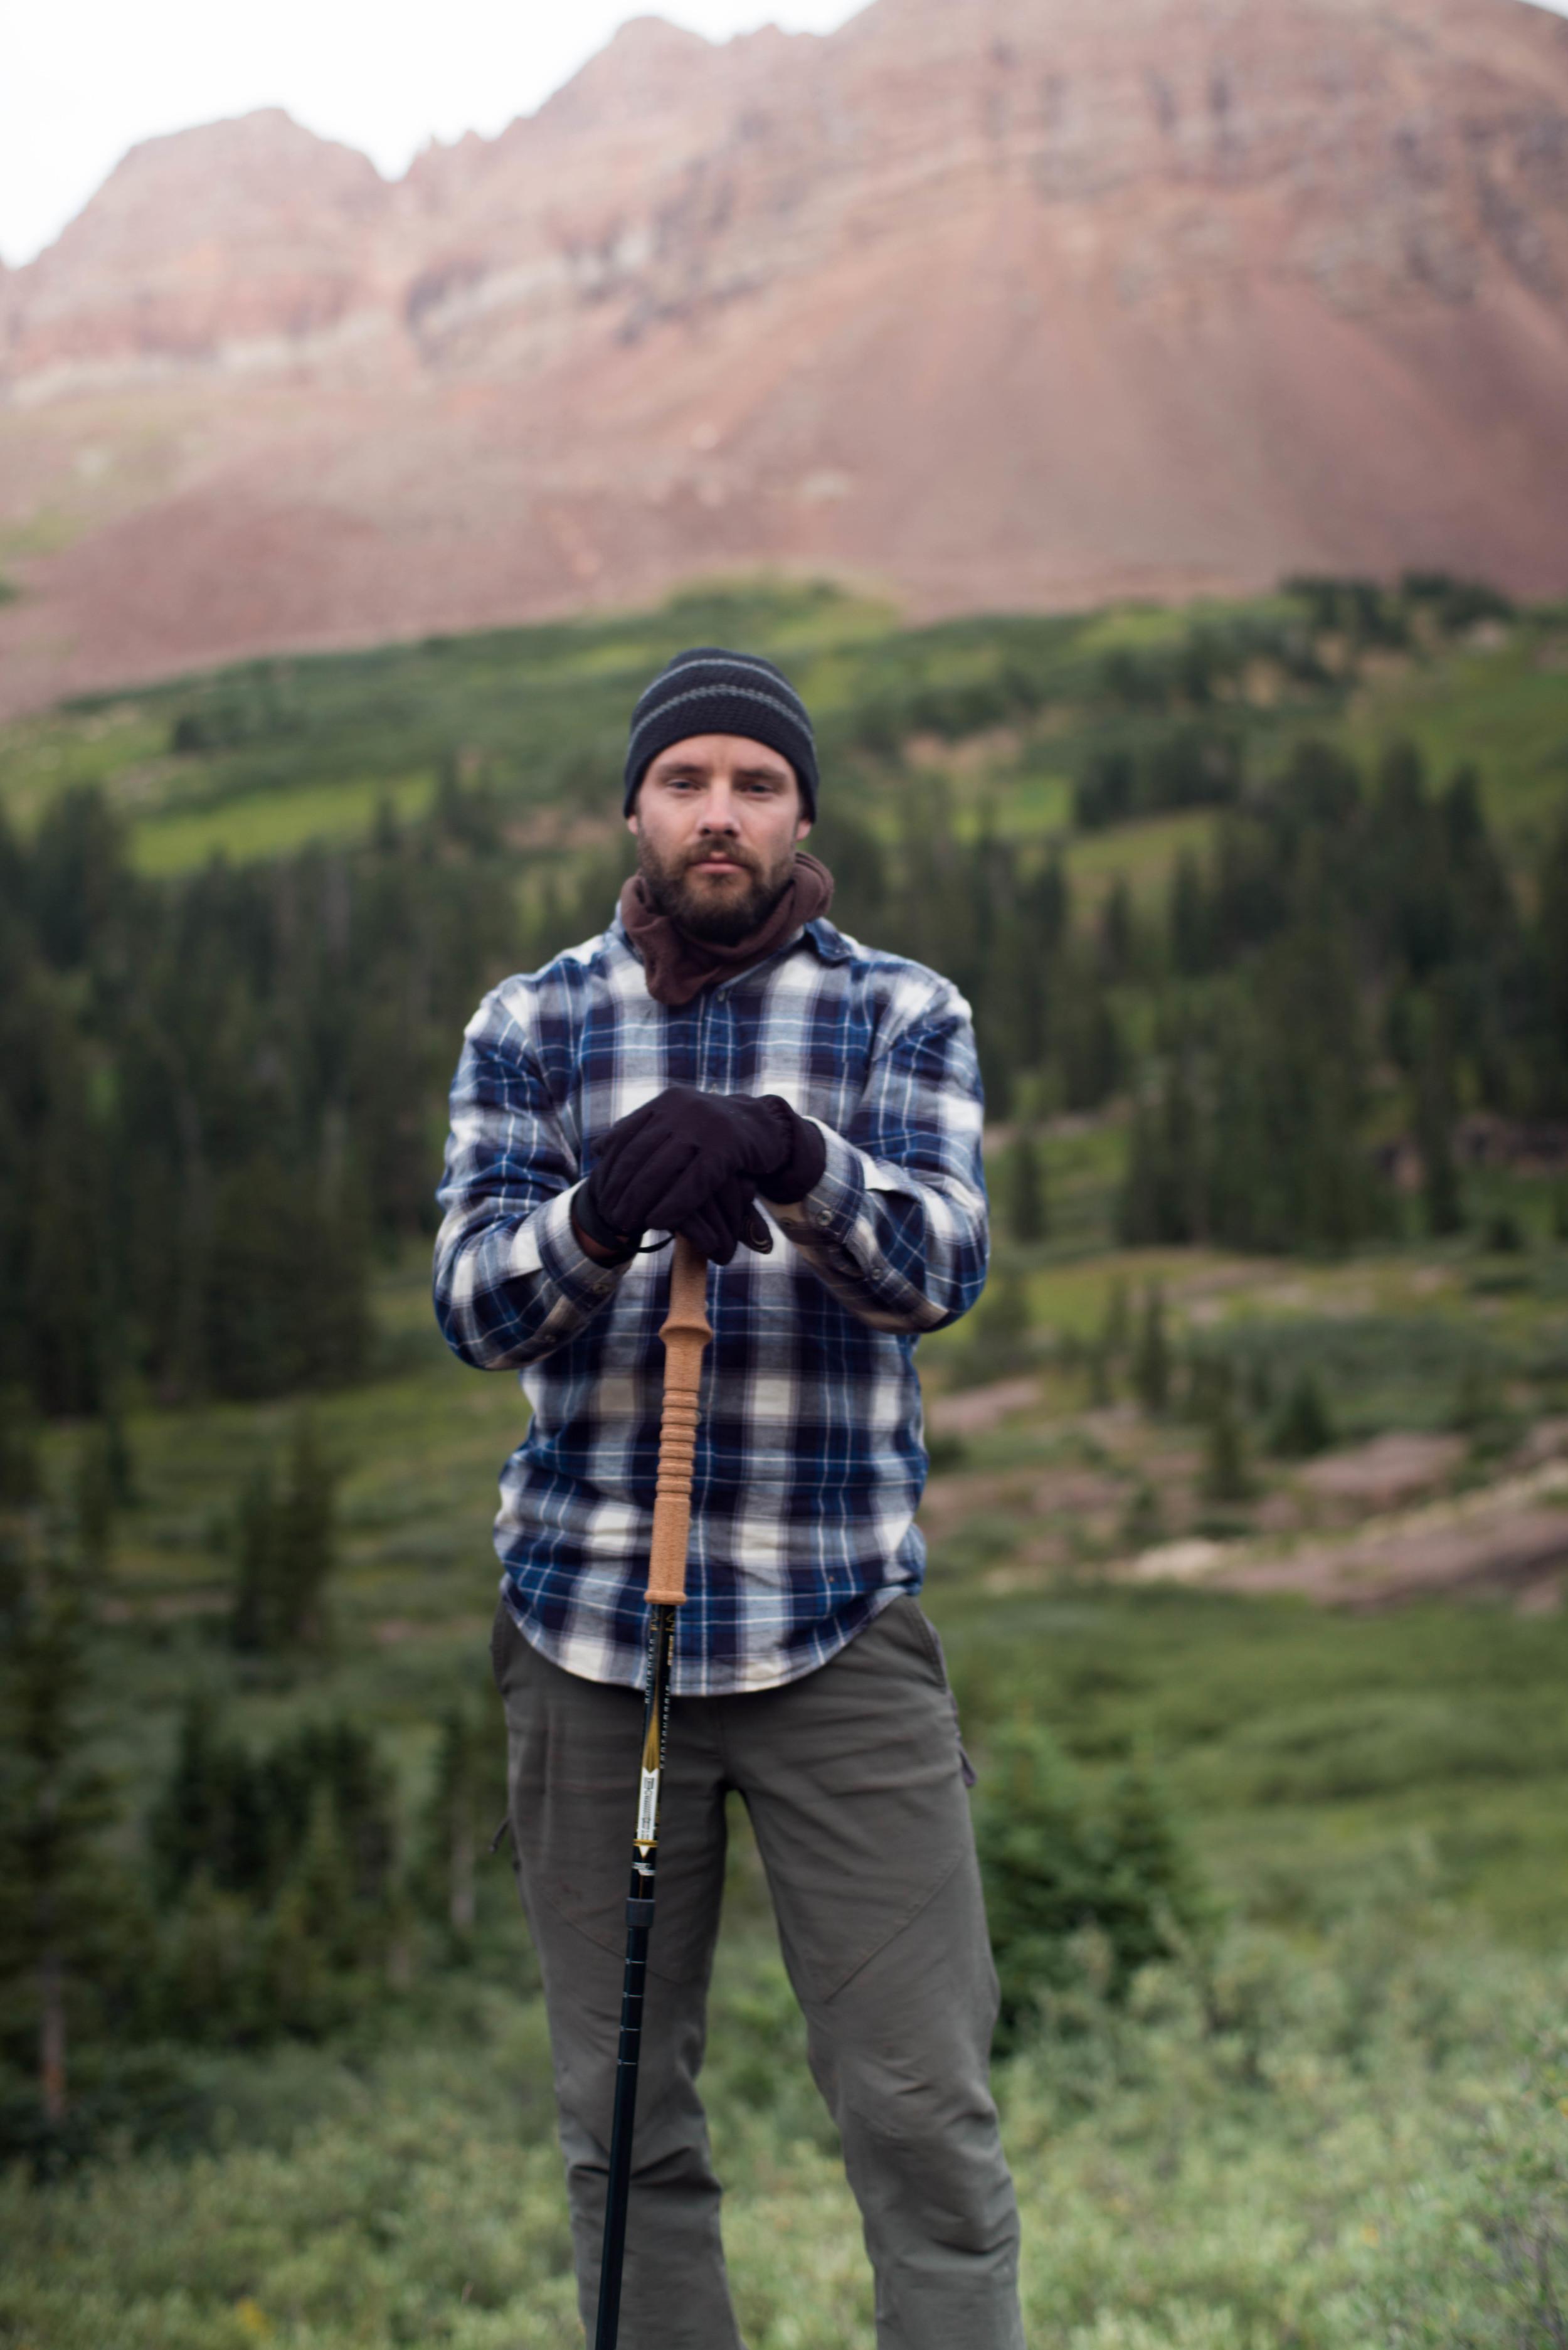 Fellow Backpacker, Travis Axe